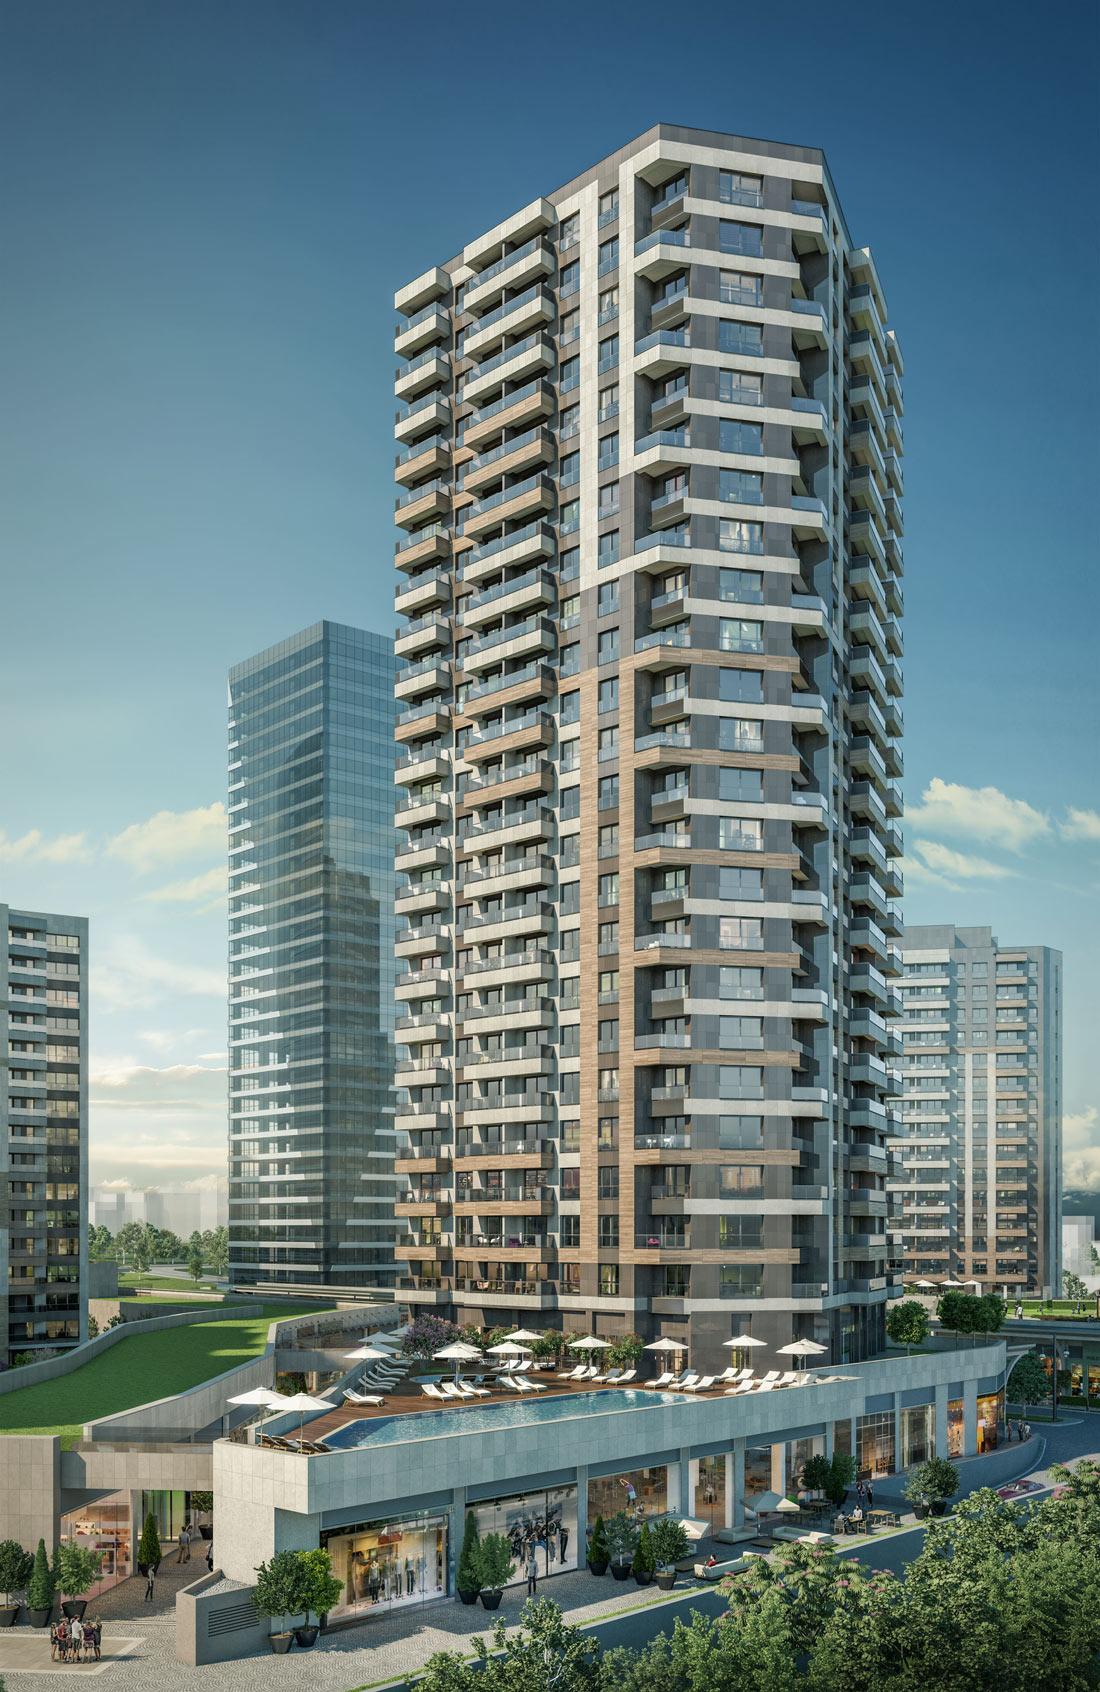 nidapark-kucukyali-istanbul-for-sale-residences-seaside9